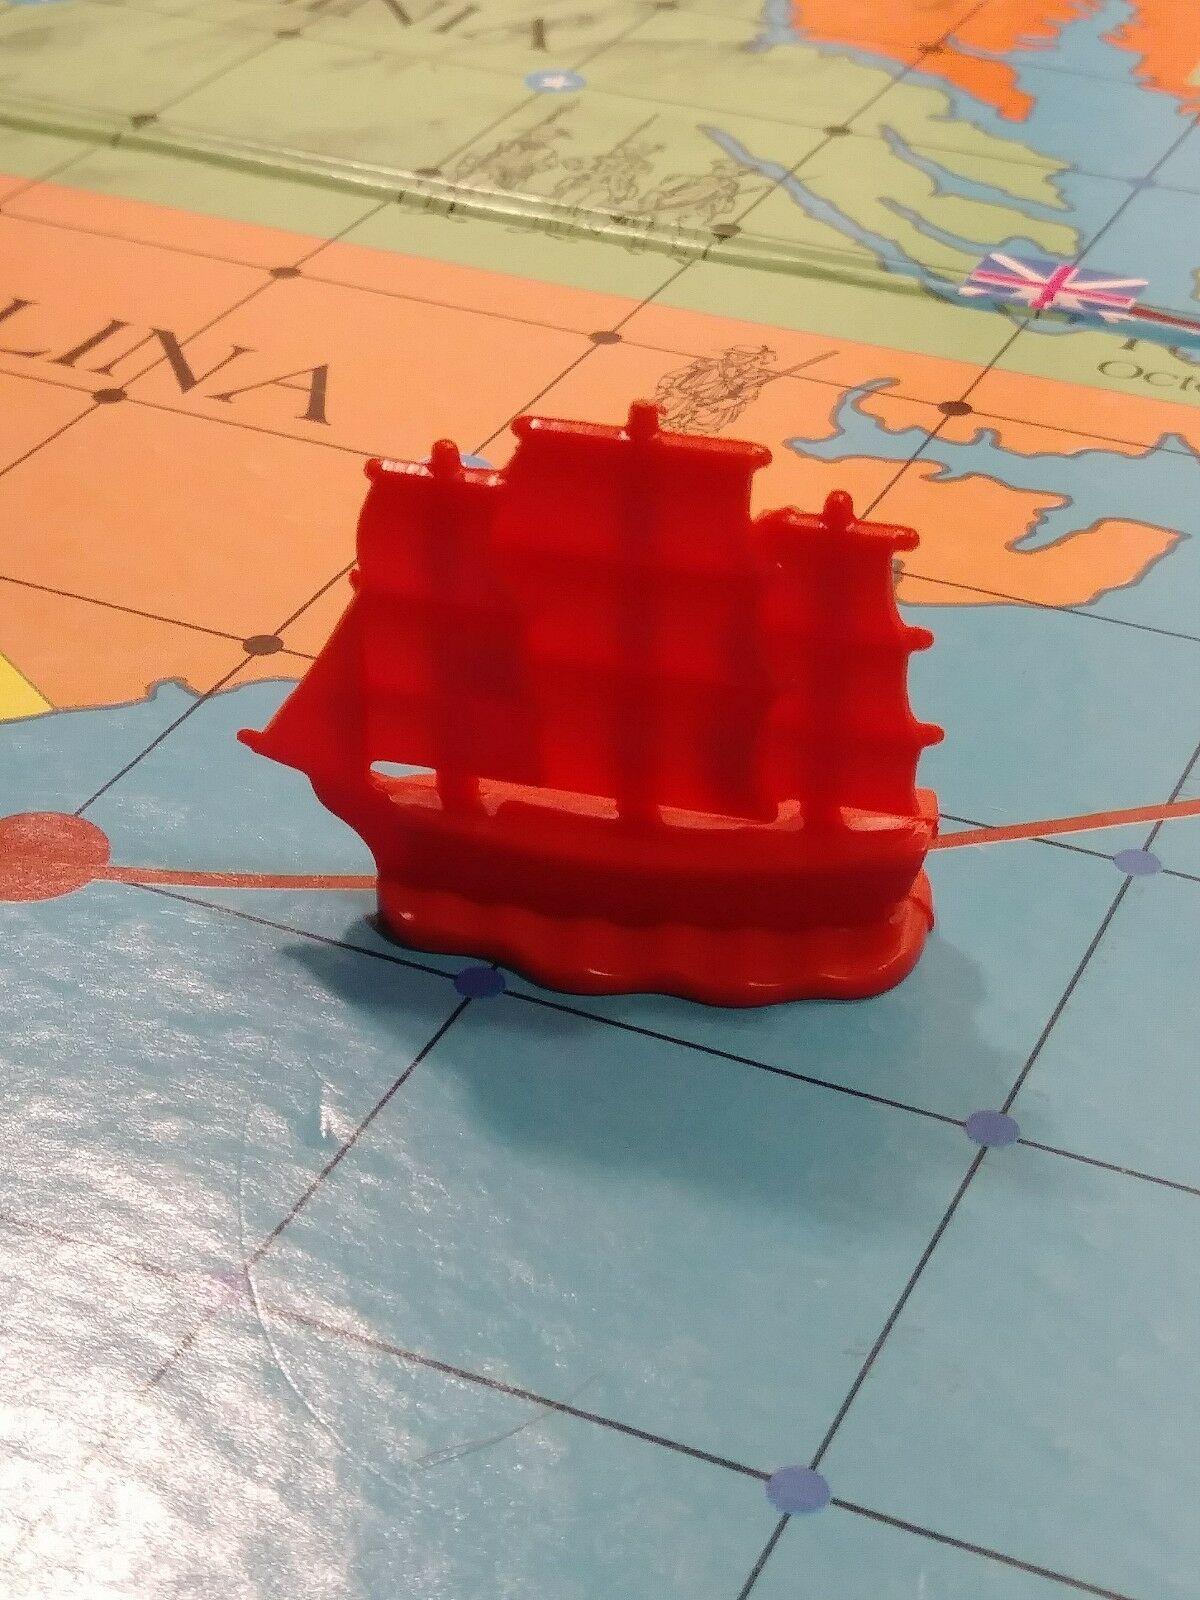 Red war ship 1975 Skirmish American Heritage Revolutionary War Game replacement - $7.50